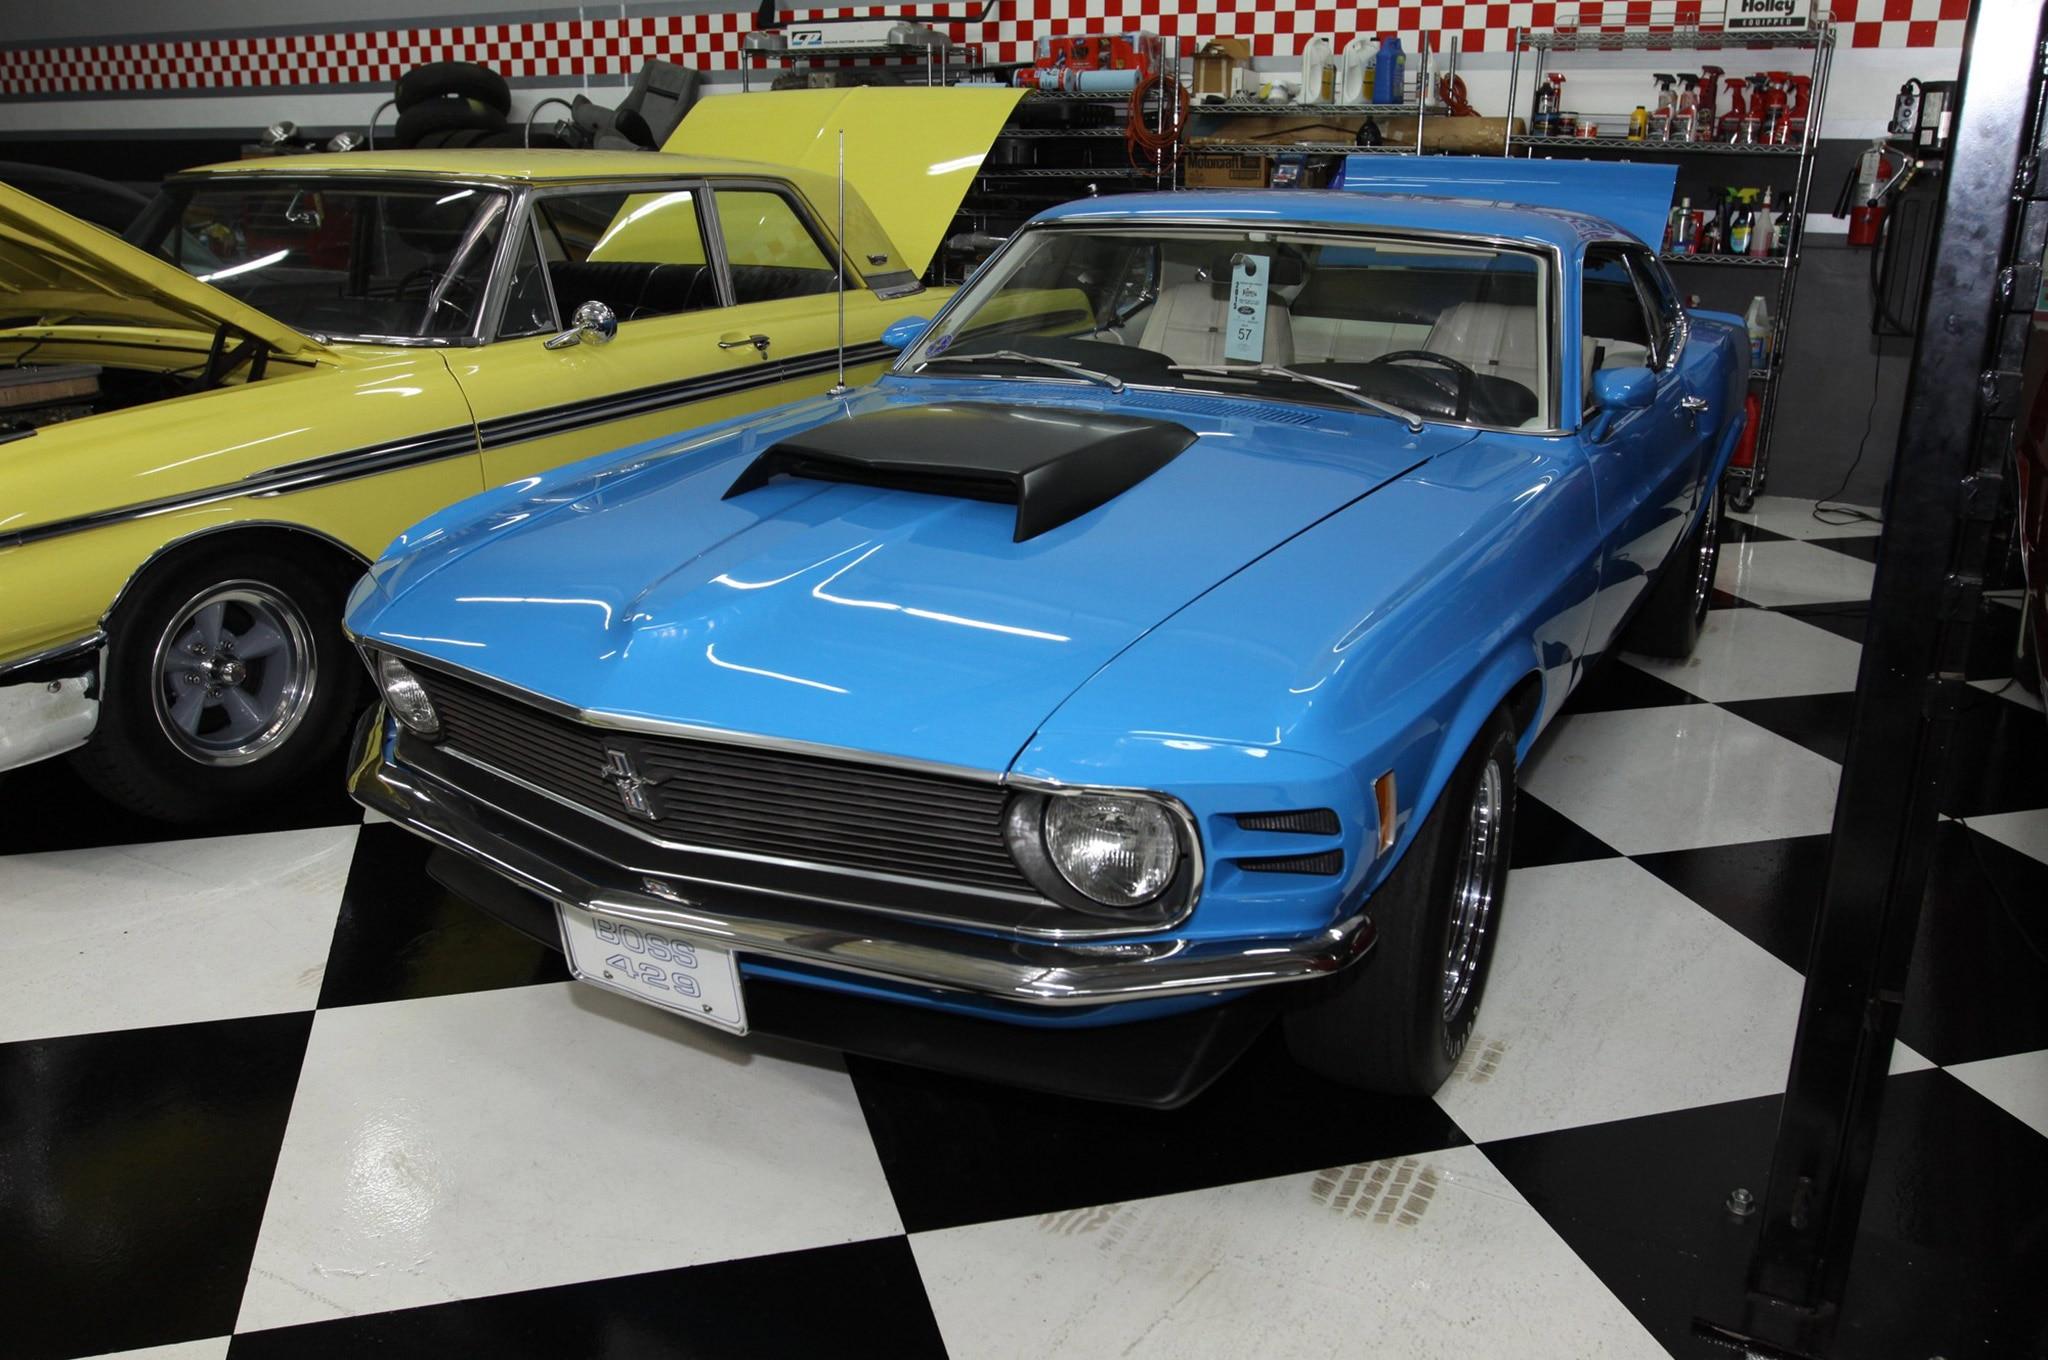 010 New Jersey AB 118 SEMA Bill Boss 429 1970